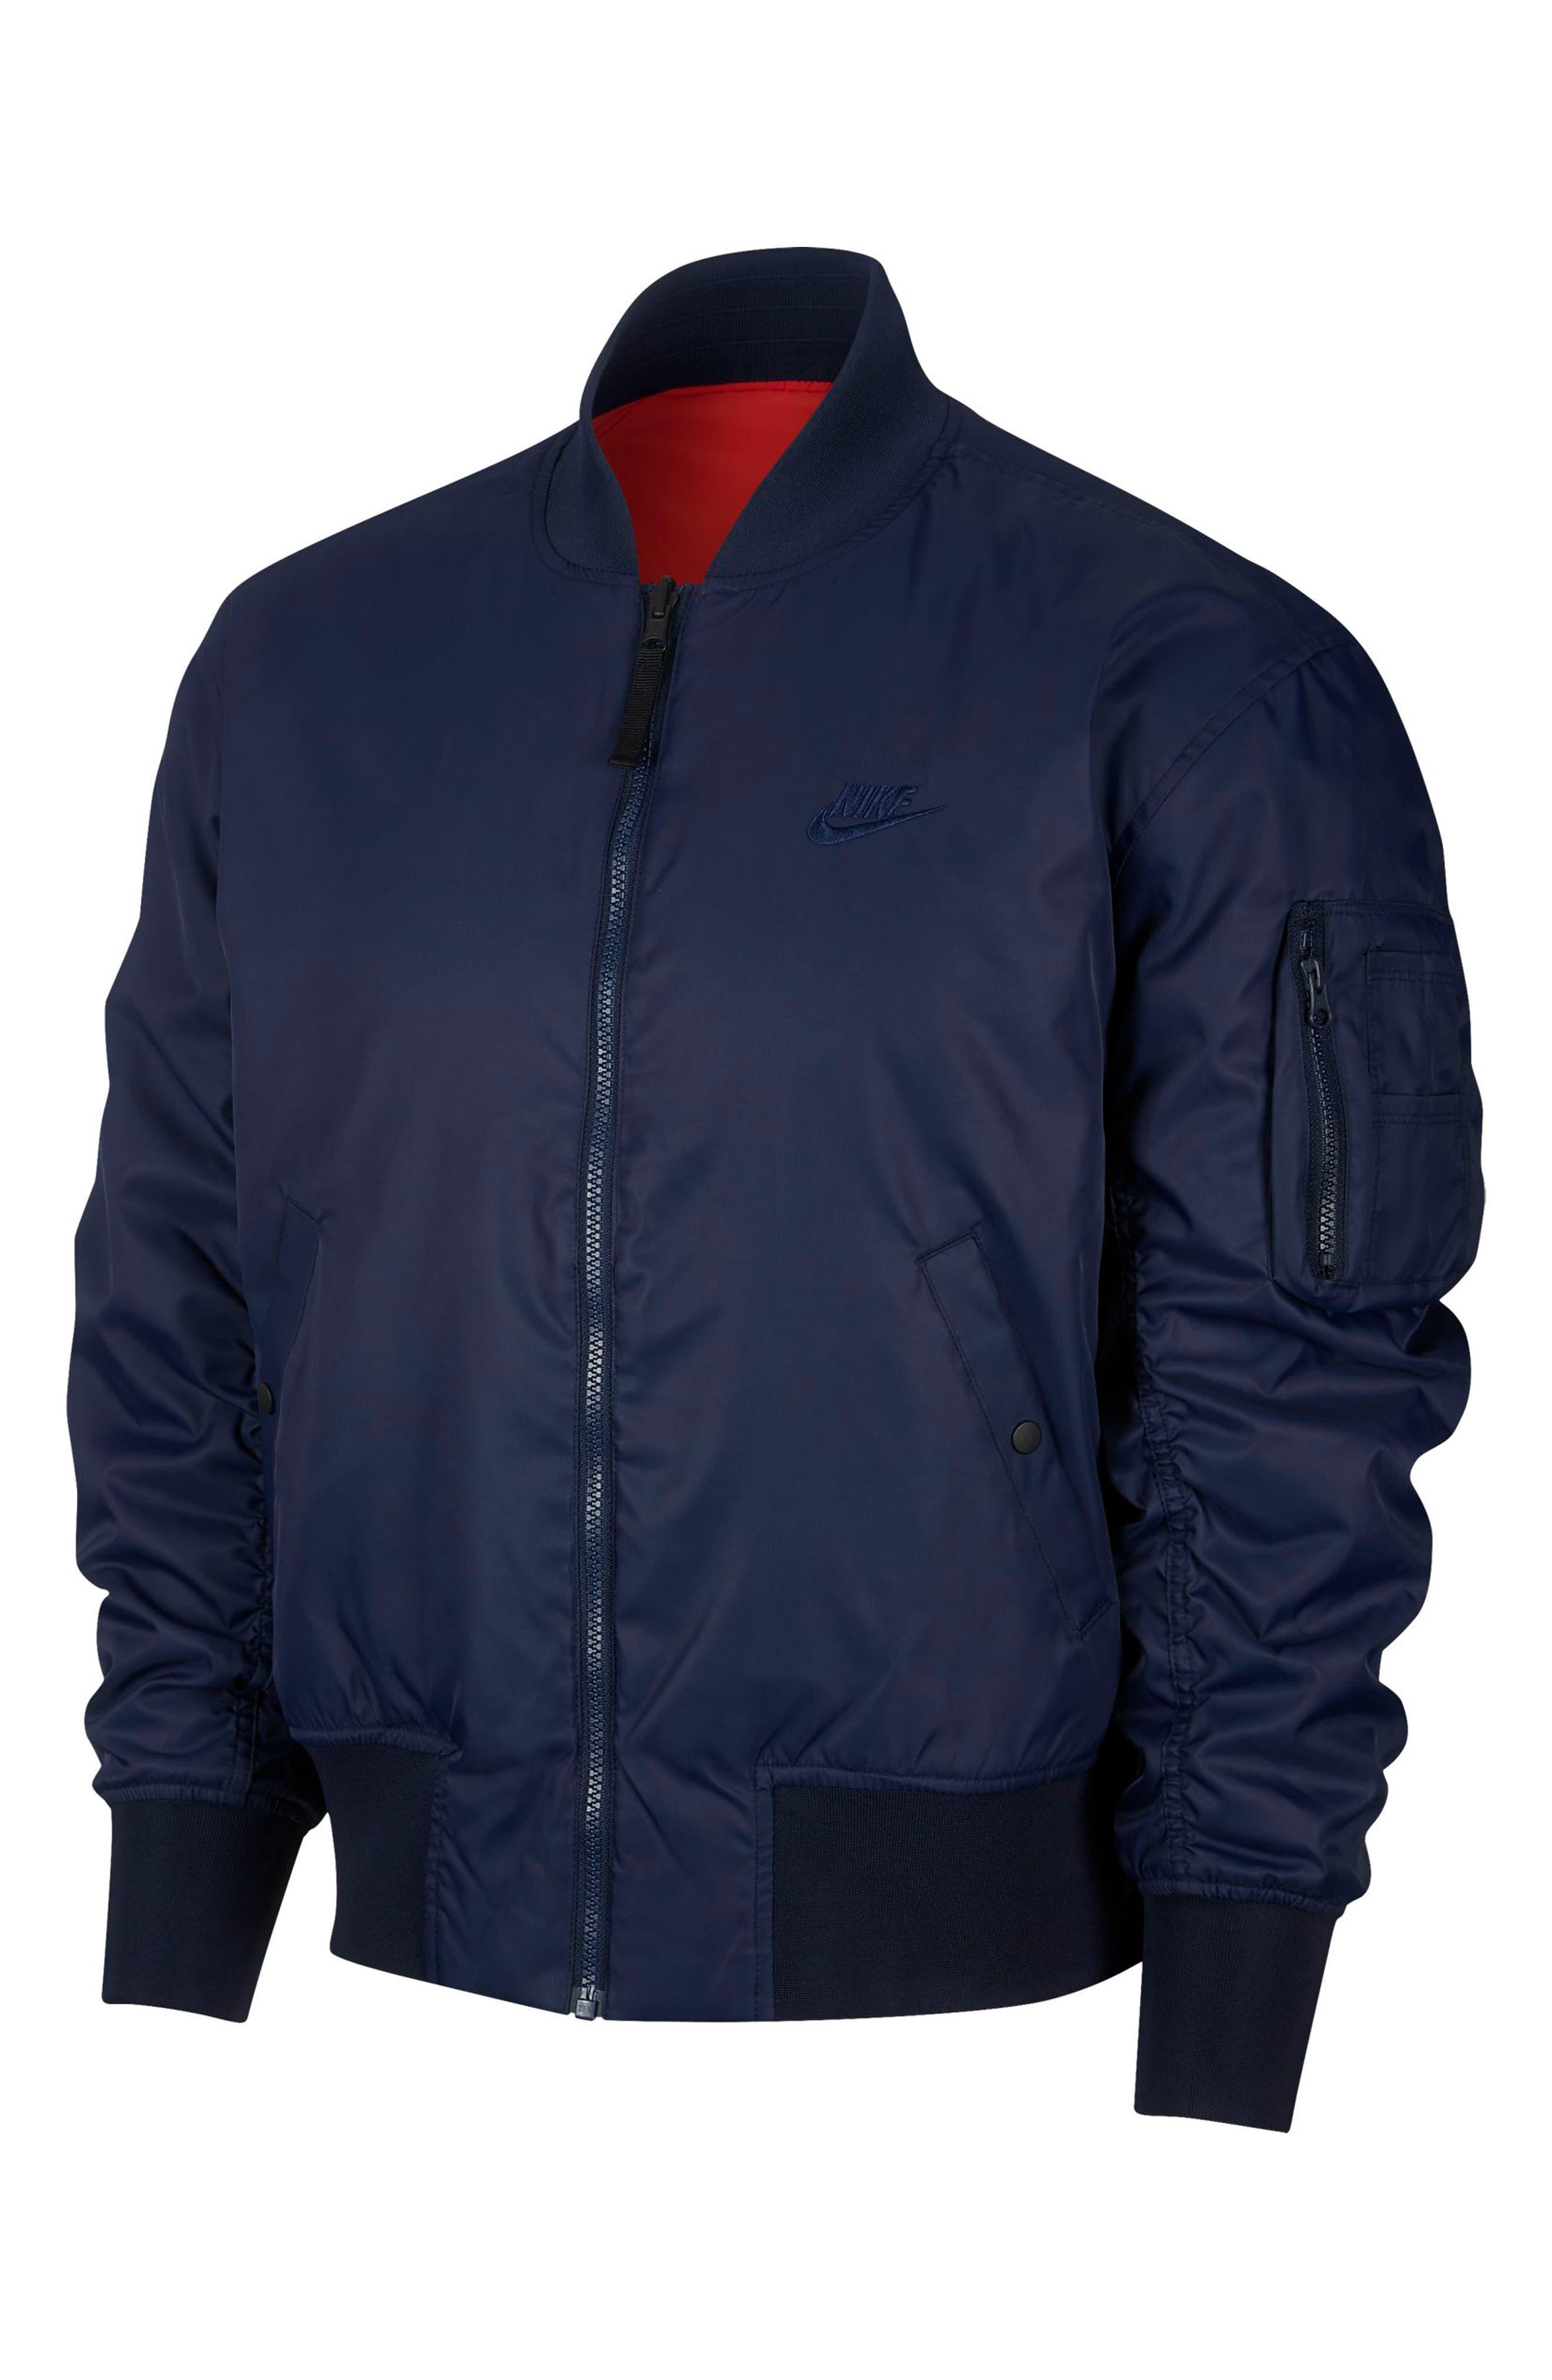 32fc3f2cc7a0 Nike Men s Black Running Jackets   Vests